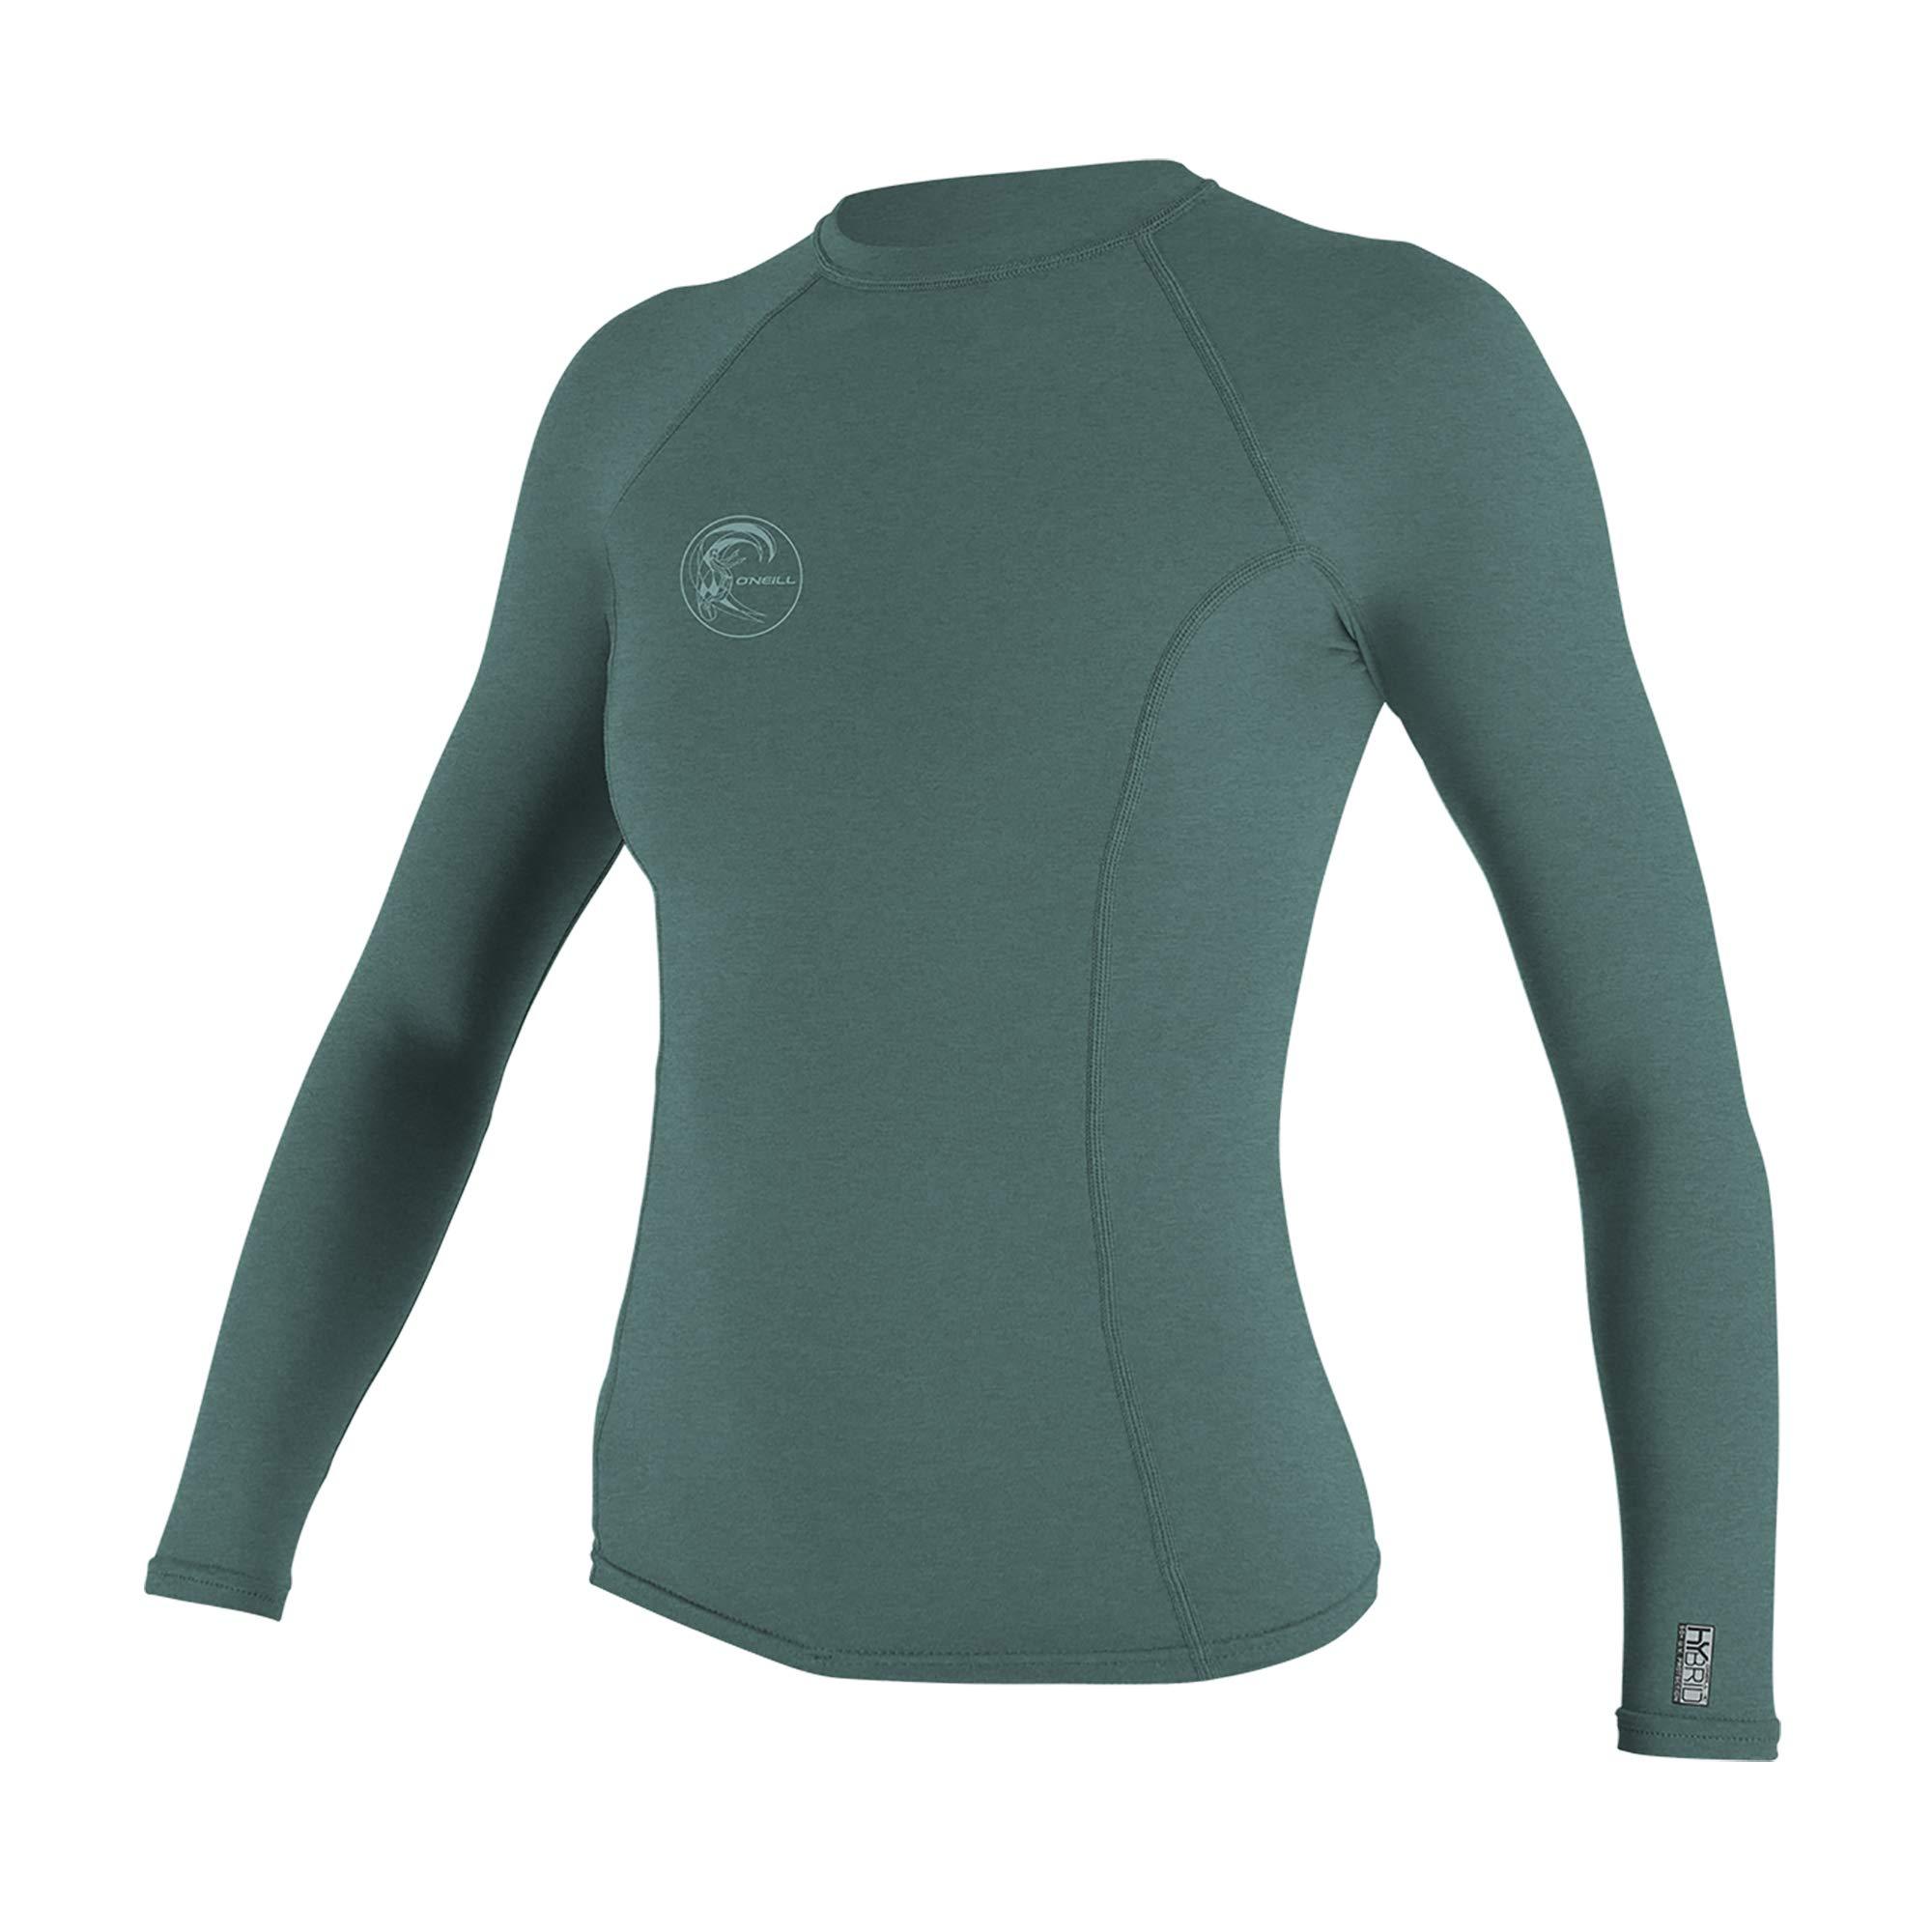 O'Neill Wetsuits Women's Hybrid UPF 50+ Long Sleeve Rash Guard, Eucalyptus, X-Small by O'Neill Wetsuits